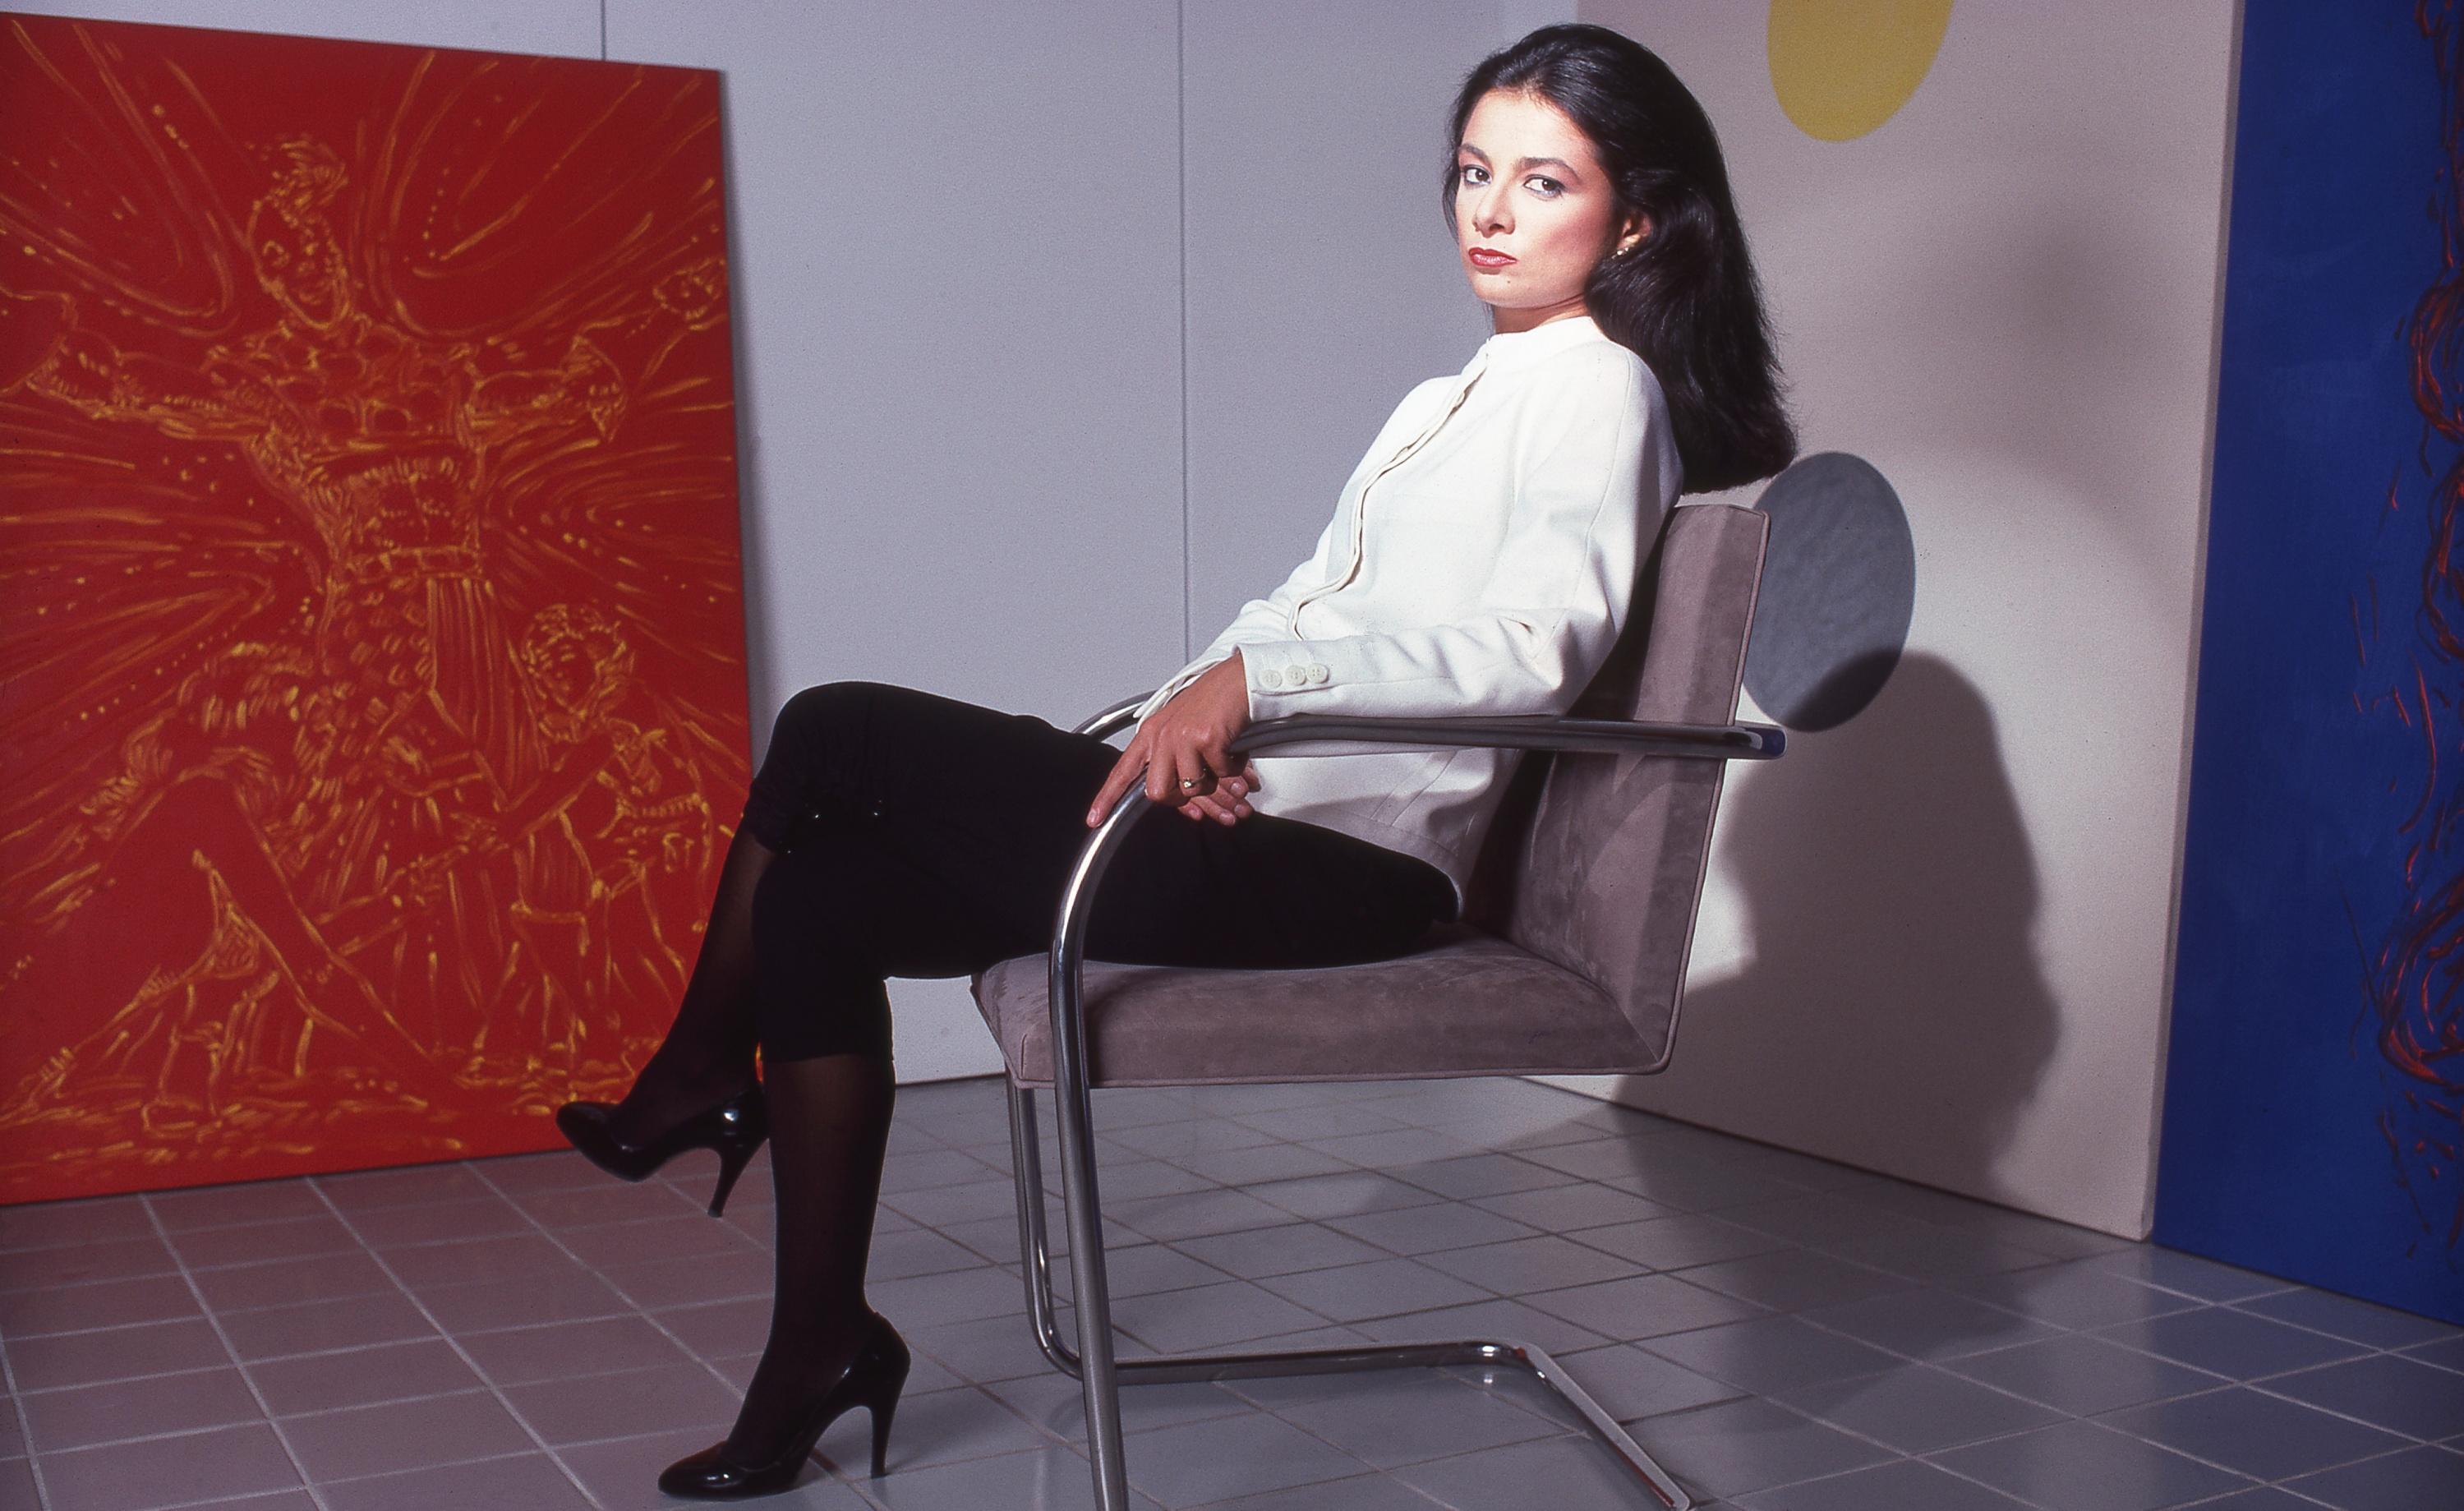 'I feel like a pariah' – how art dealer Mary Boone fell from grace